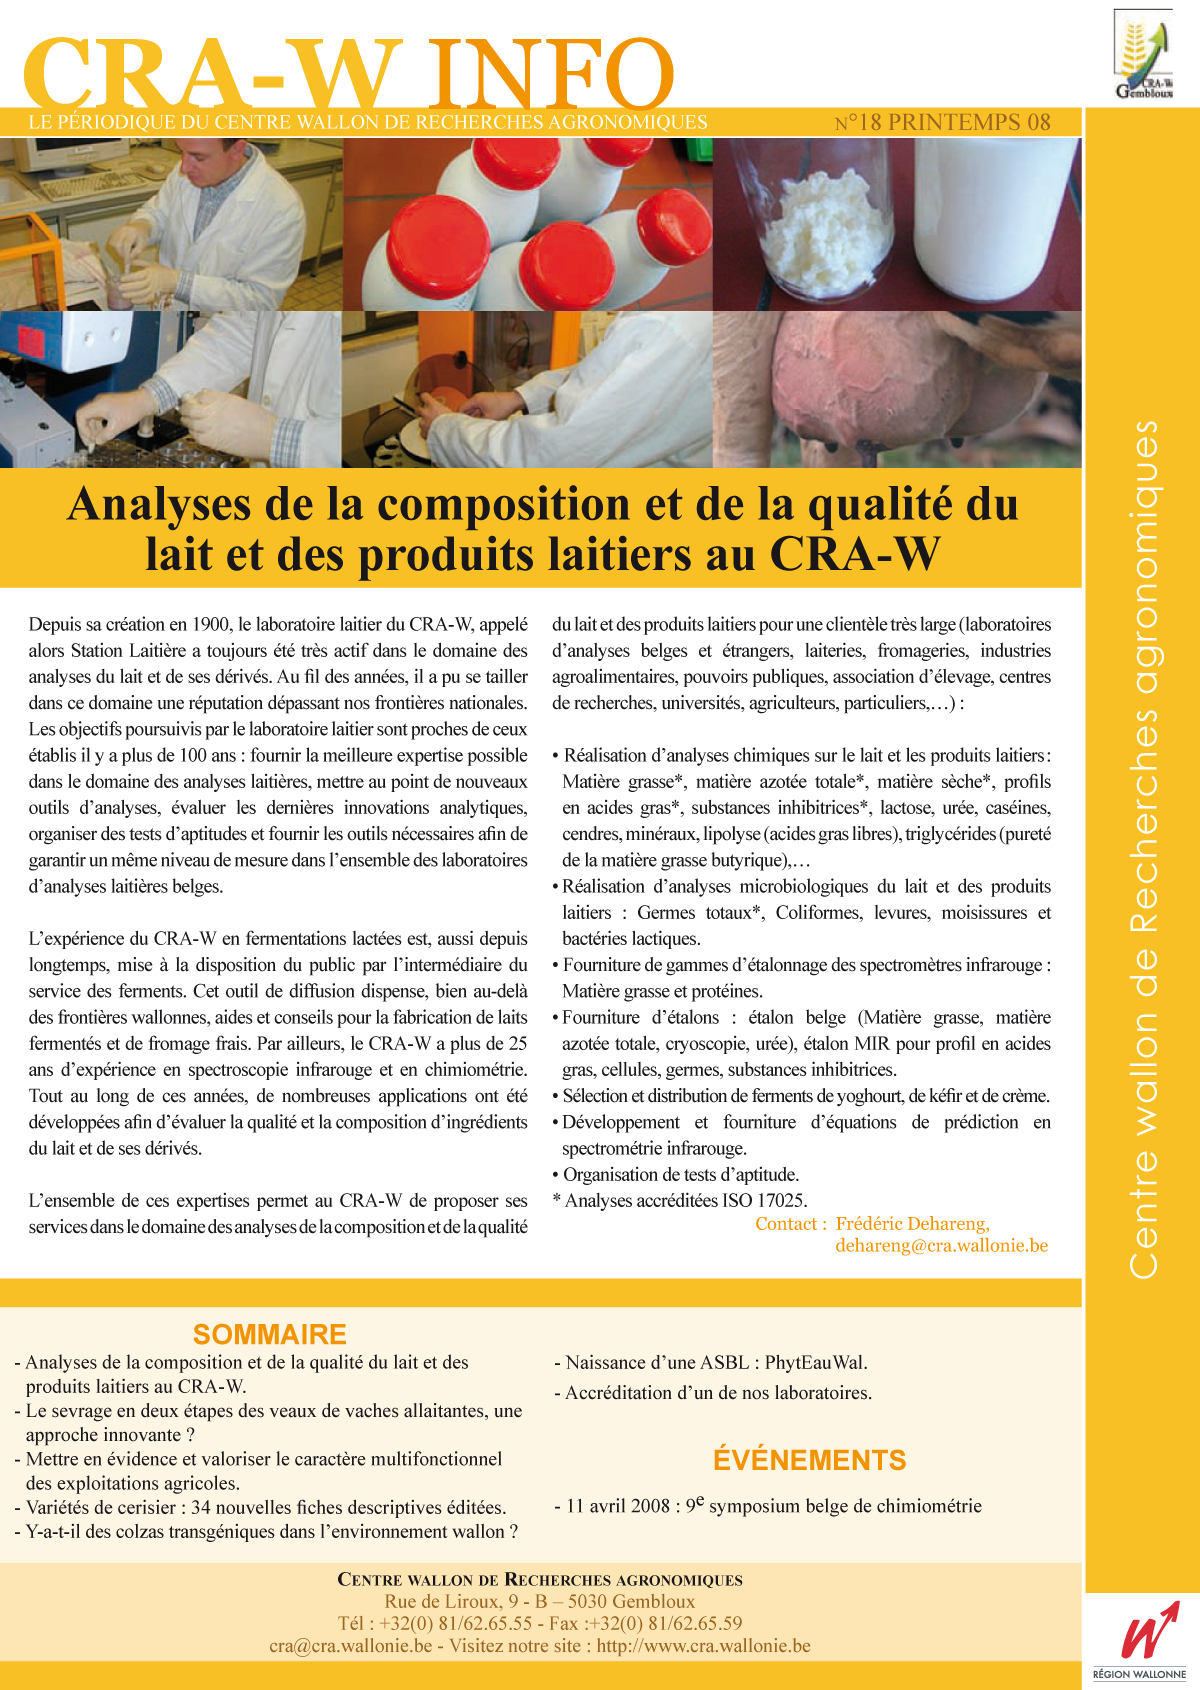 CRAW info n° 18